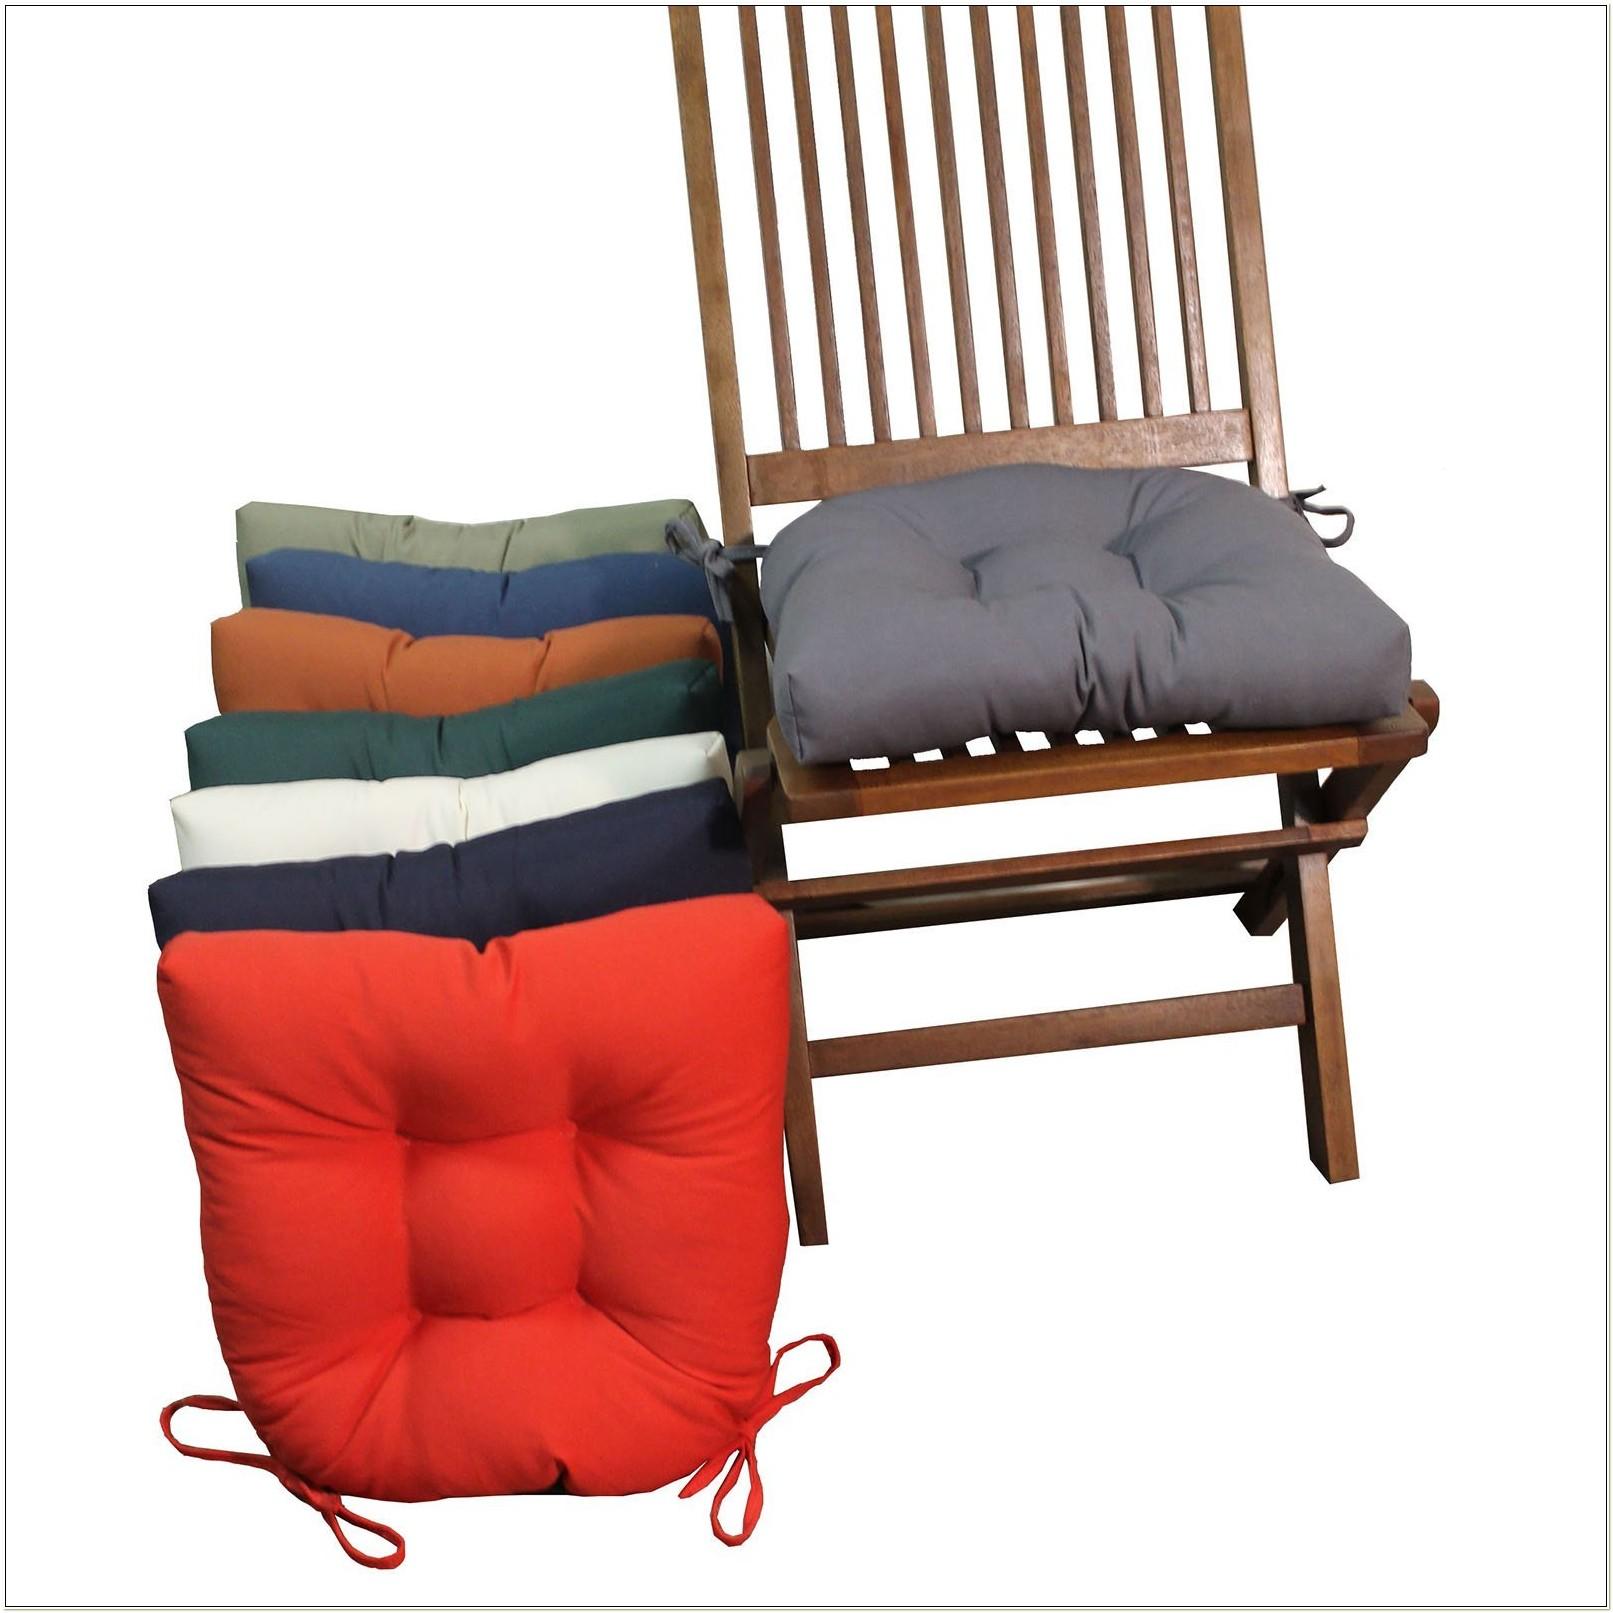 U Shaped Outdoor Chair Cushions